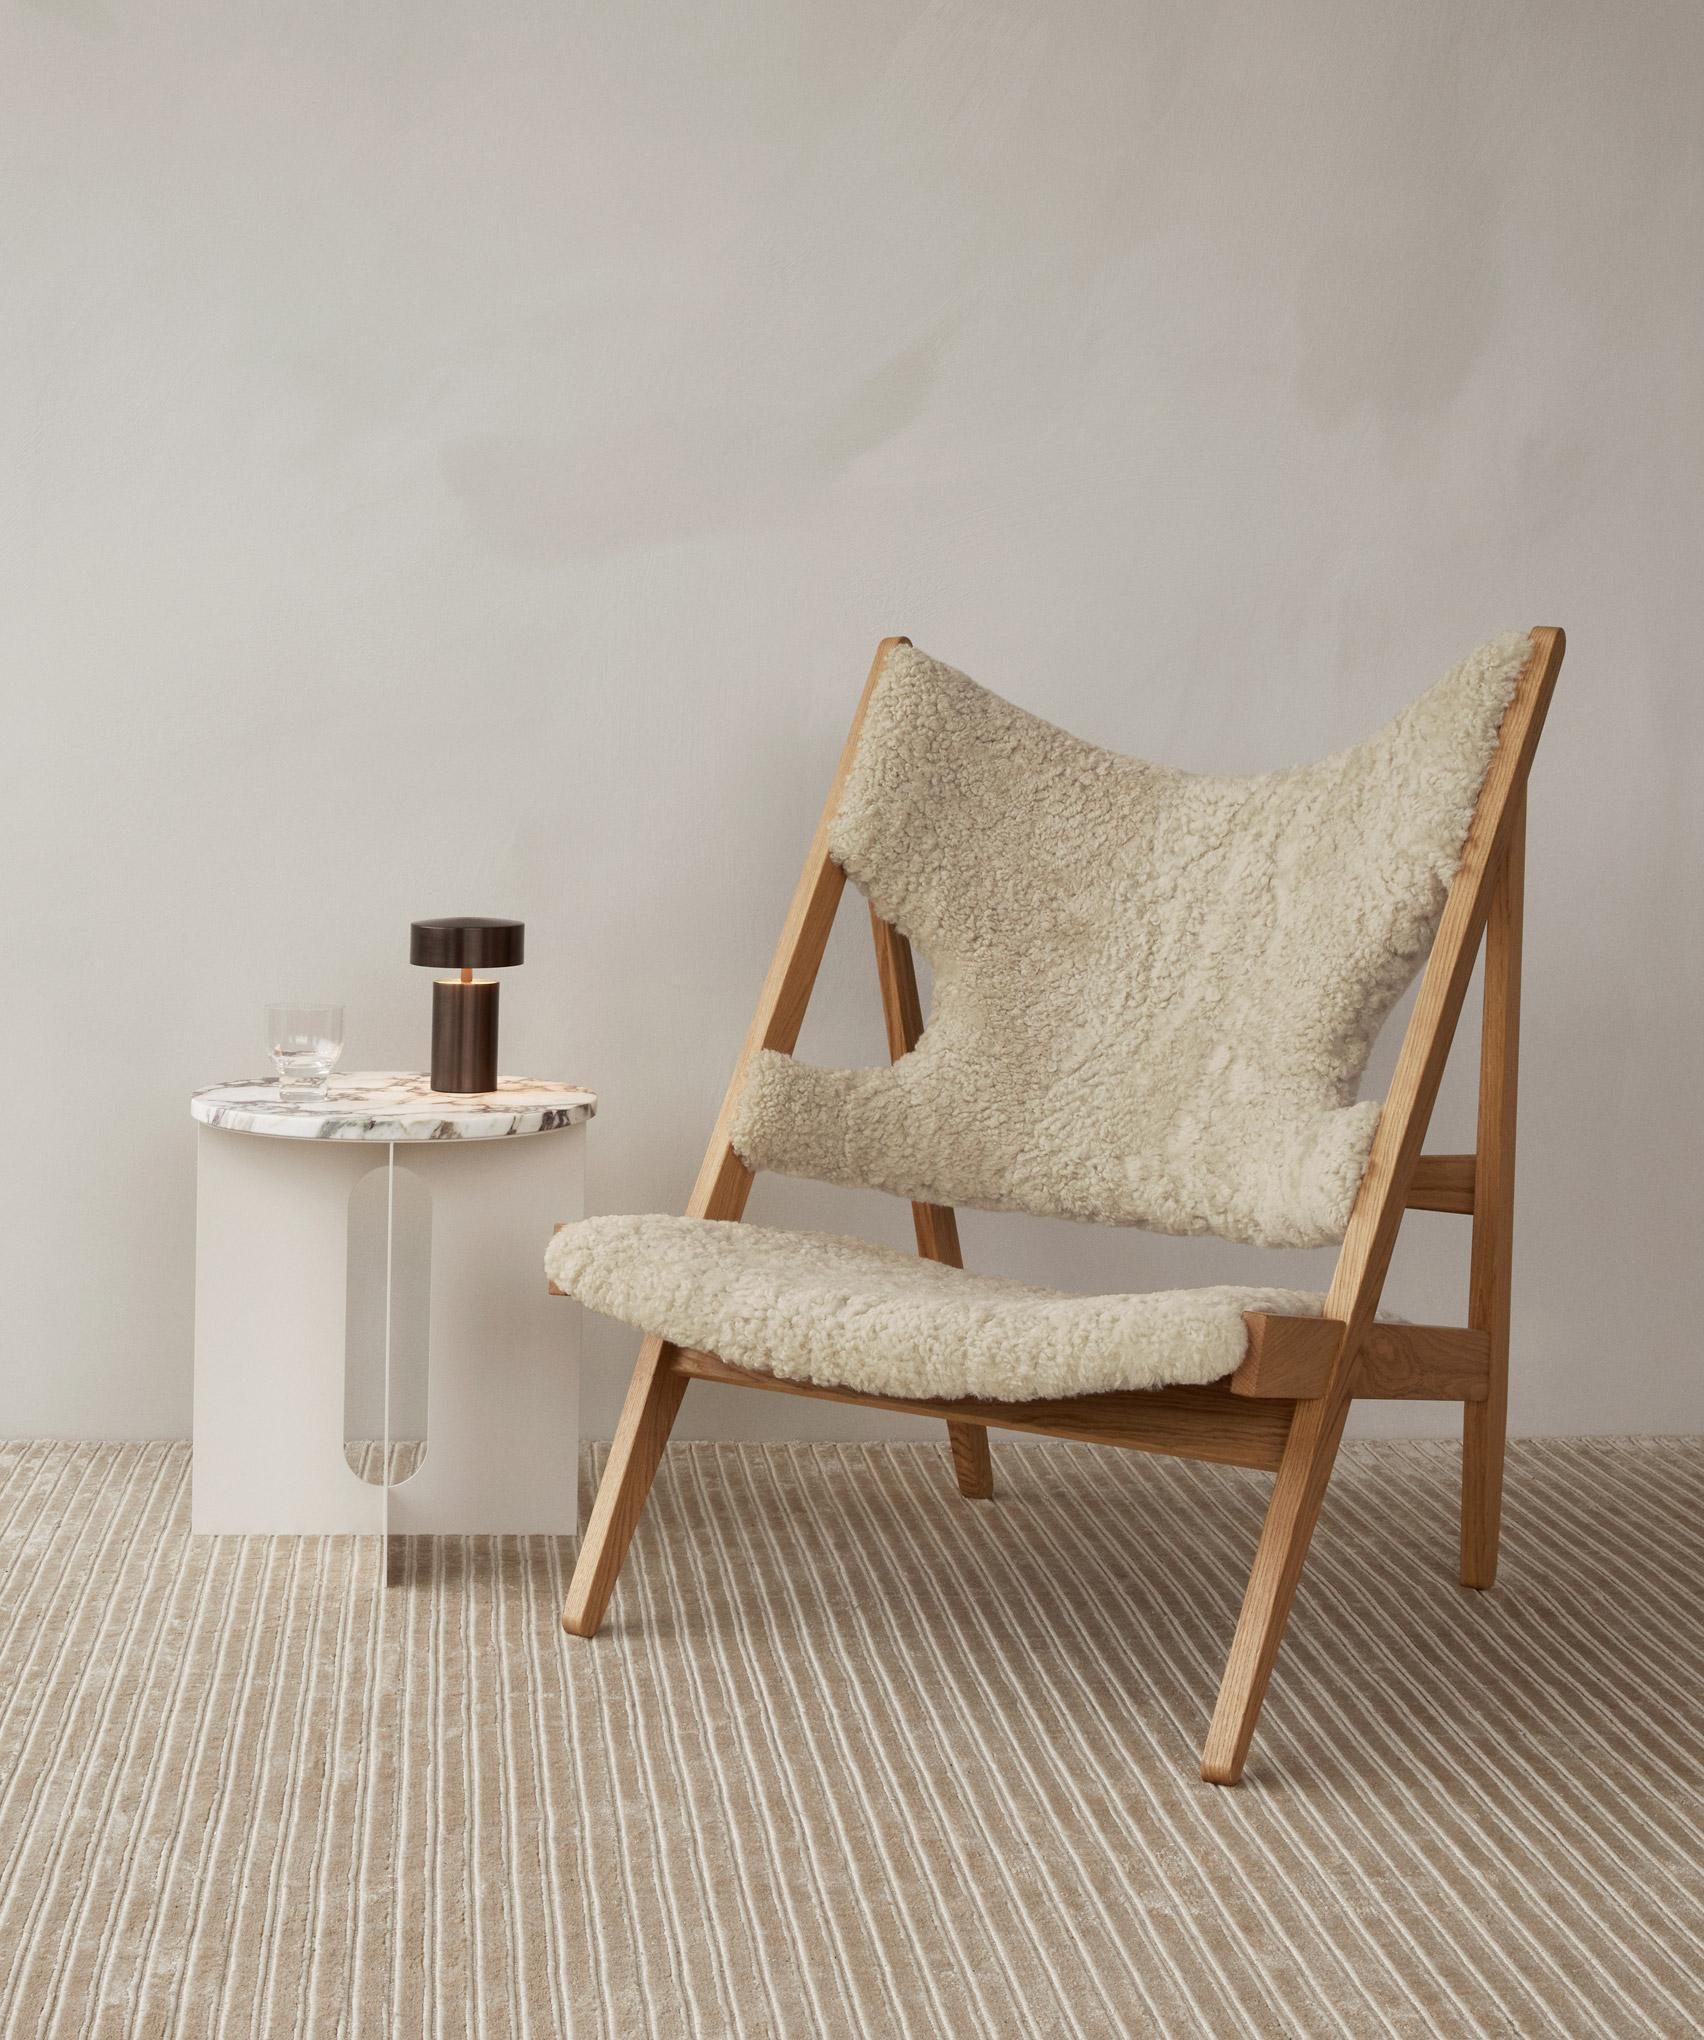 Lounge chair by Ib Kofod-Larsen with sheepskin upholstery